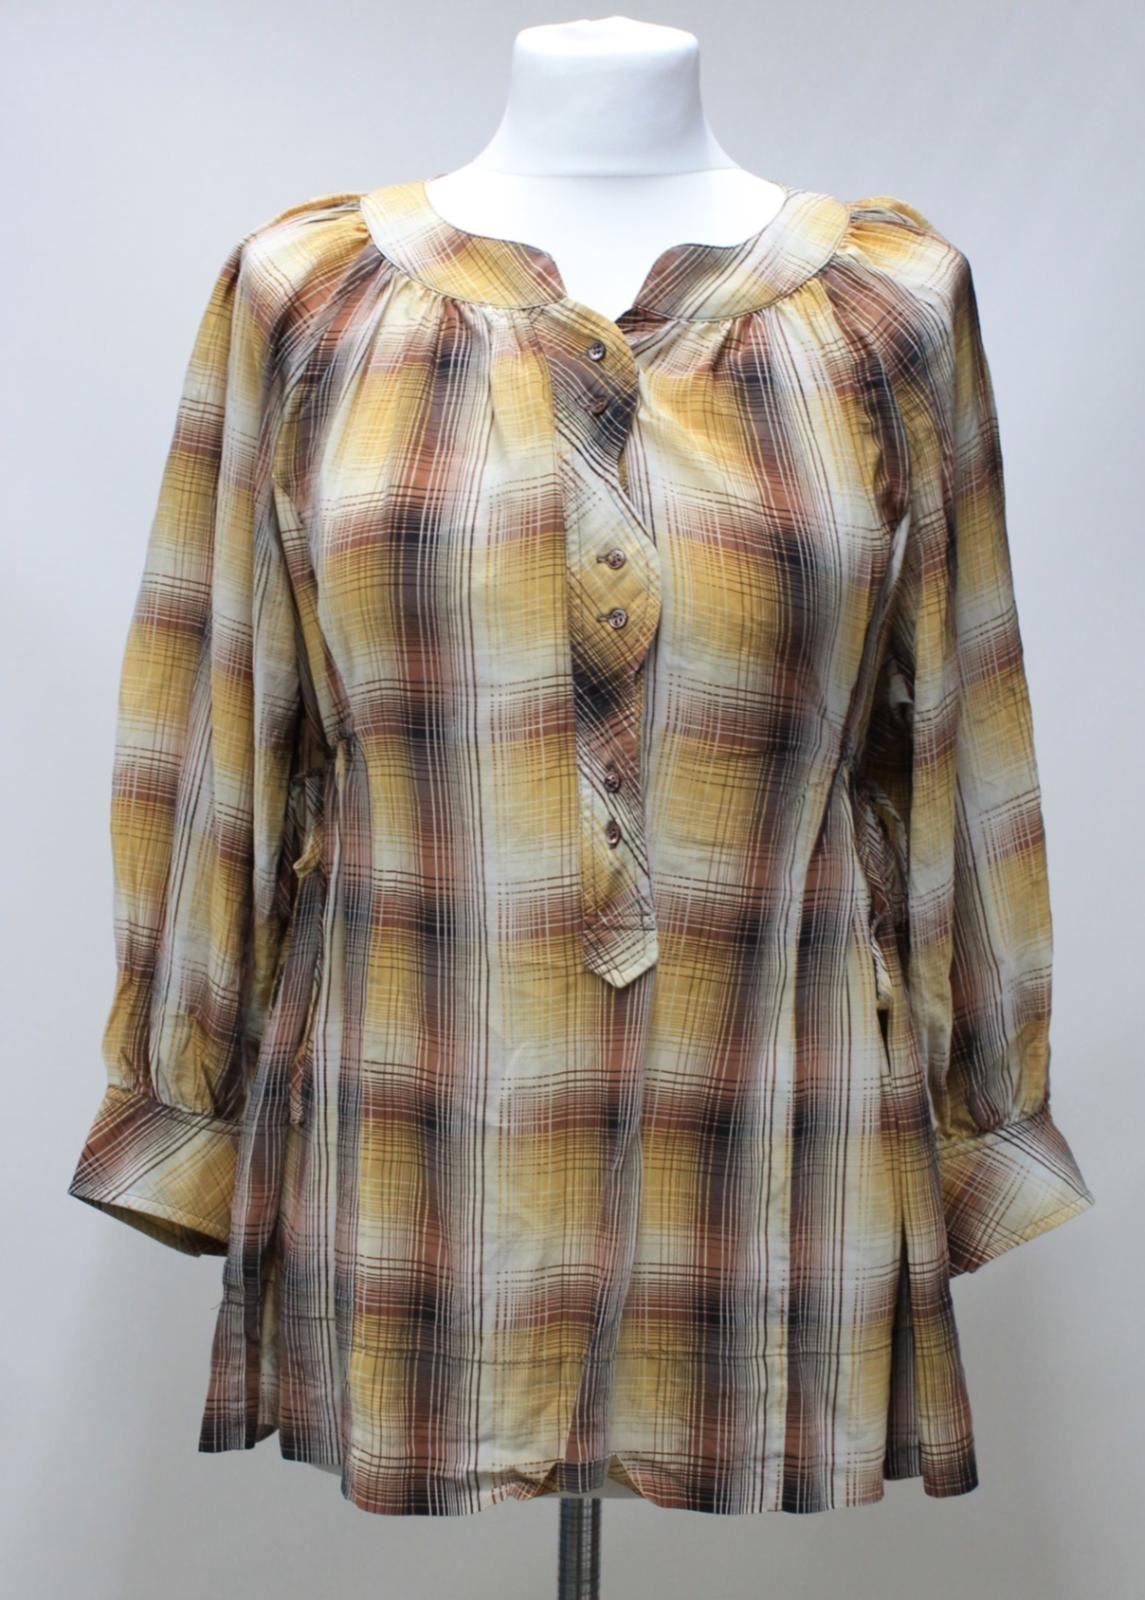 BCBG MAXAZRIA Ladies Honeycomb braun Silk Plaid Print 3 4 Sleeve Blouse Größe UK8